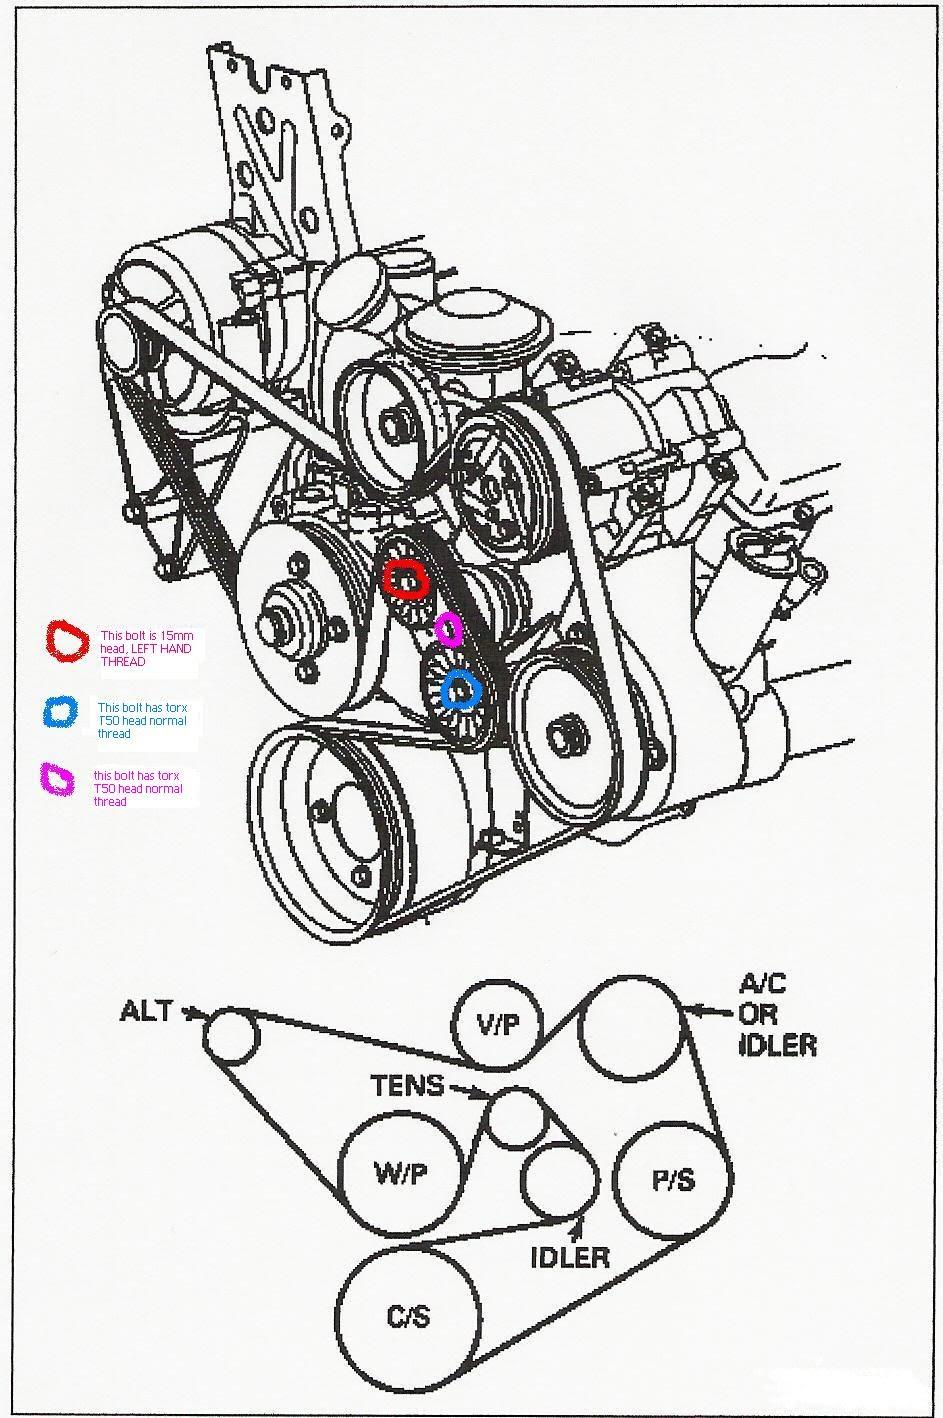 hight resolution of diagrams oldforddiesels 1992 ford f 350 7 3 diesel fuel system pictures 7 3 idi belt diagram